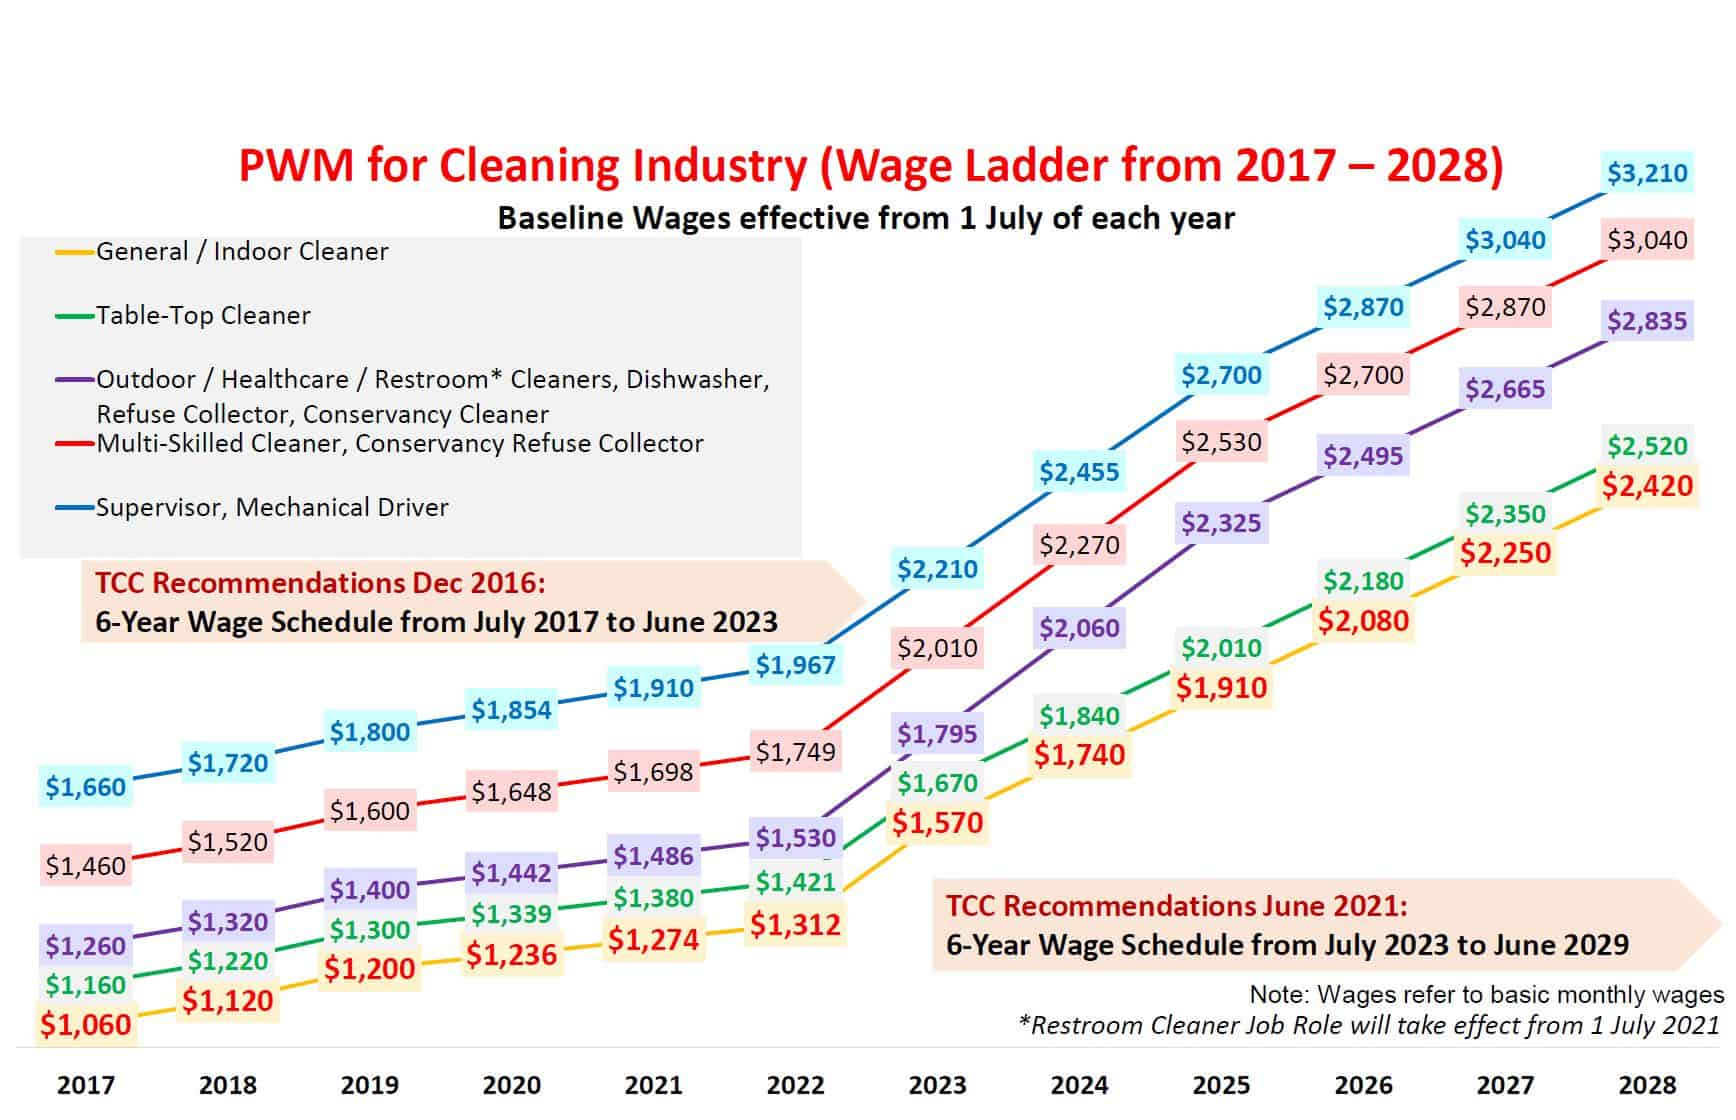 Progressive Wage Model, Making a case for the cleaners through the Progressive Wage Model